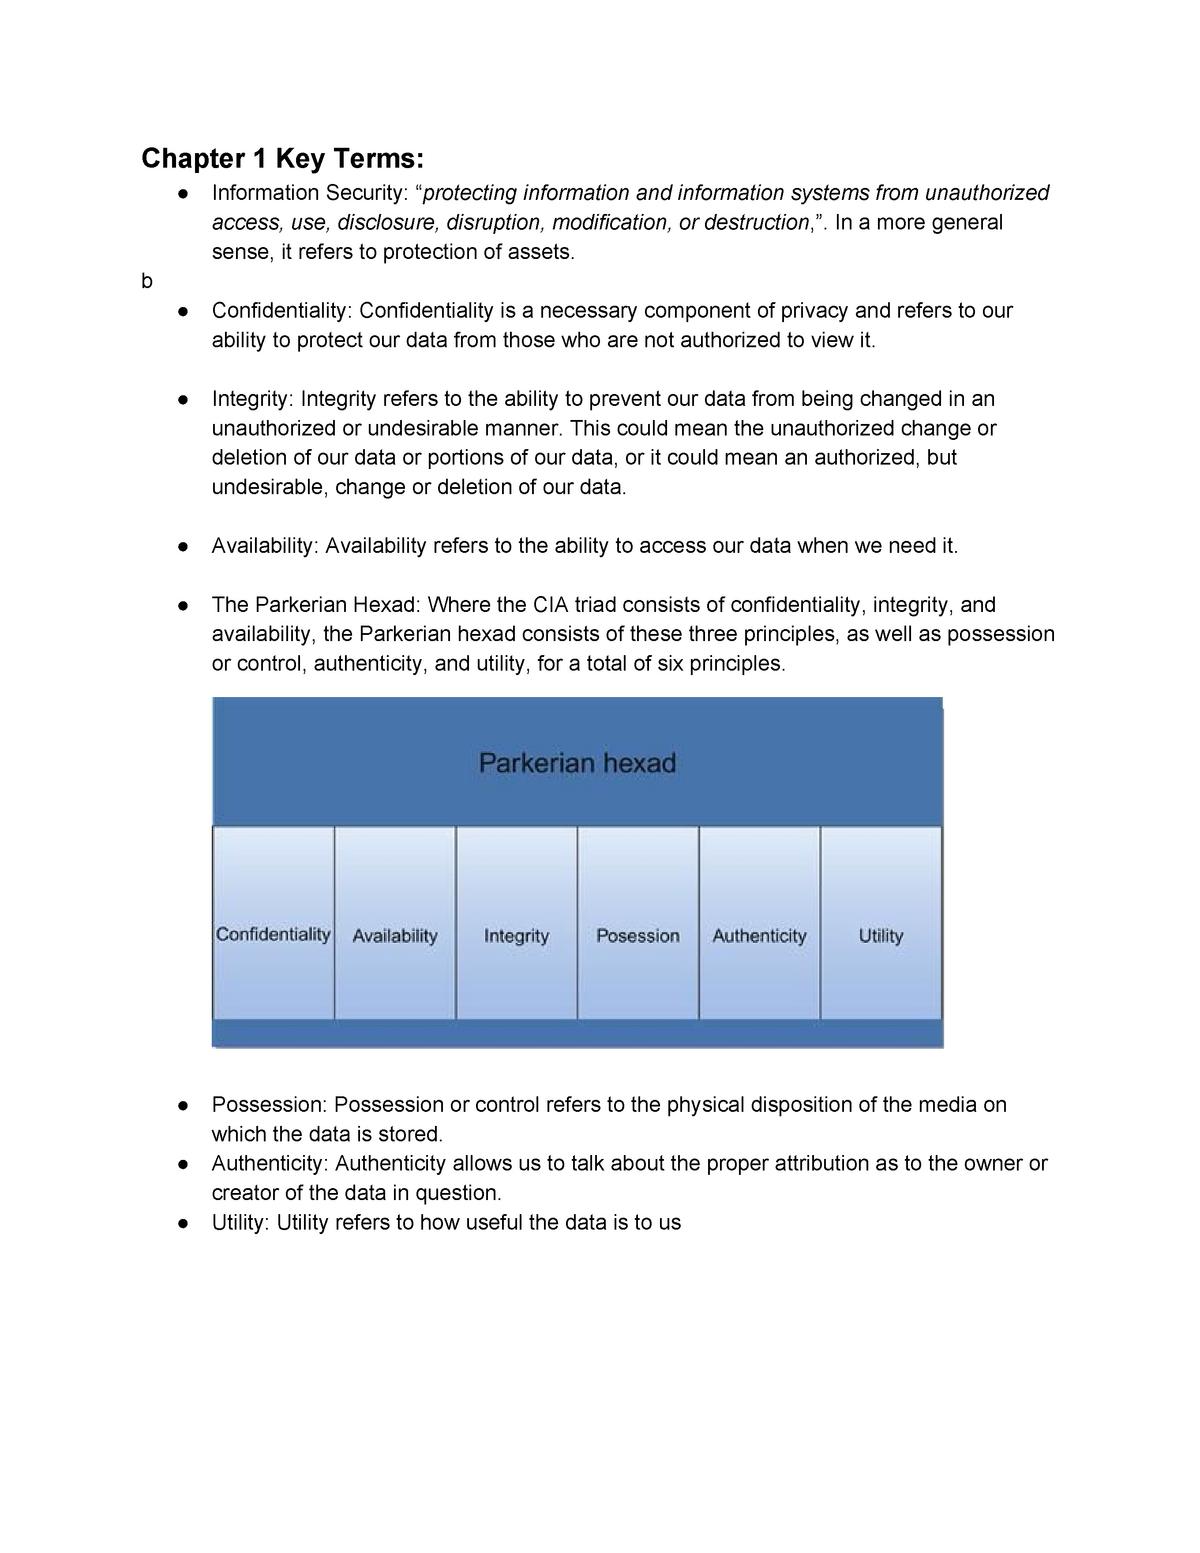 CYSE 101 Midterm 1 Study Guide - StuDocu